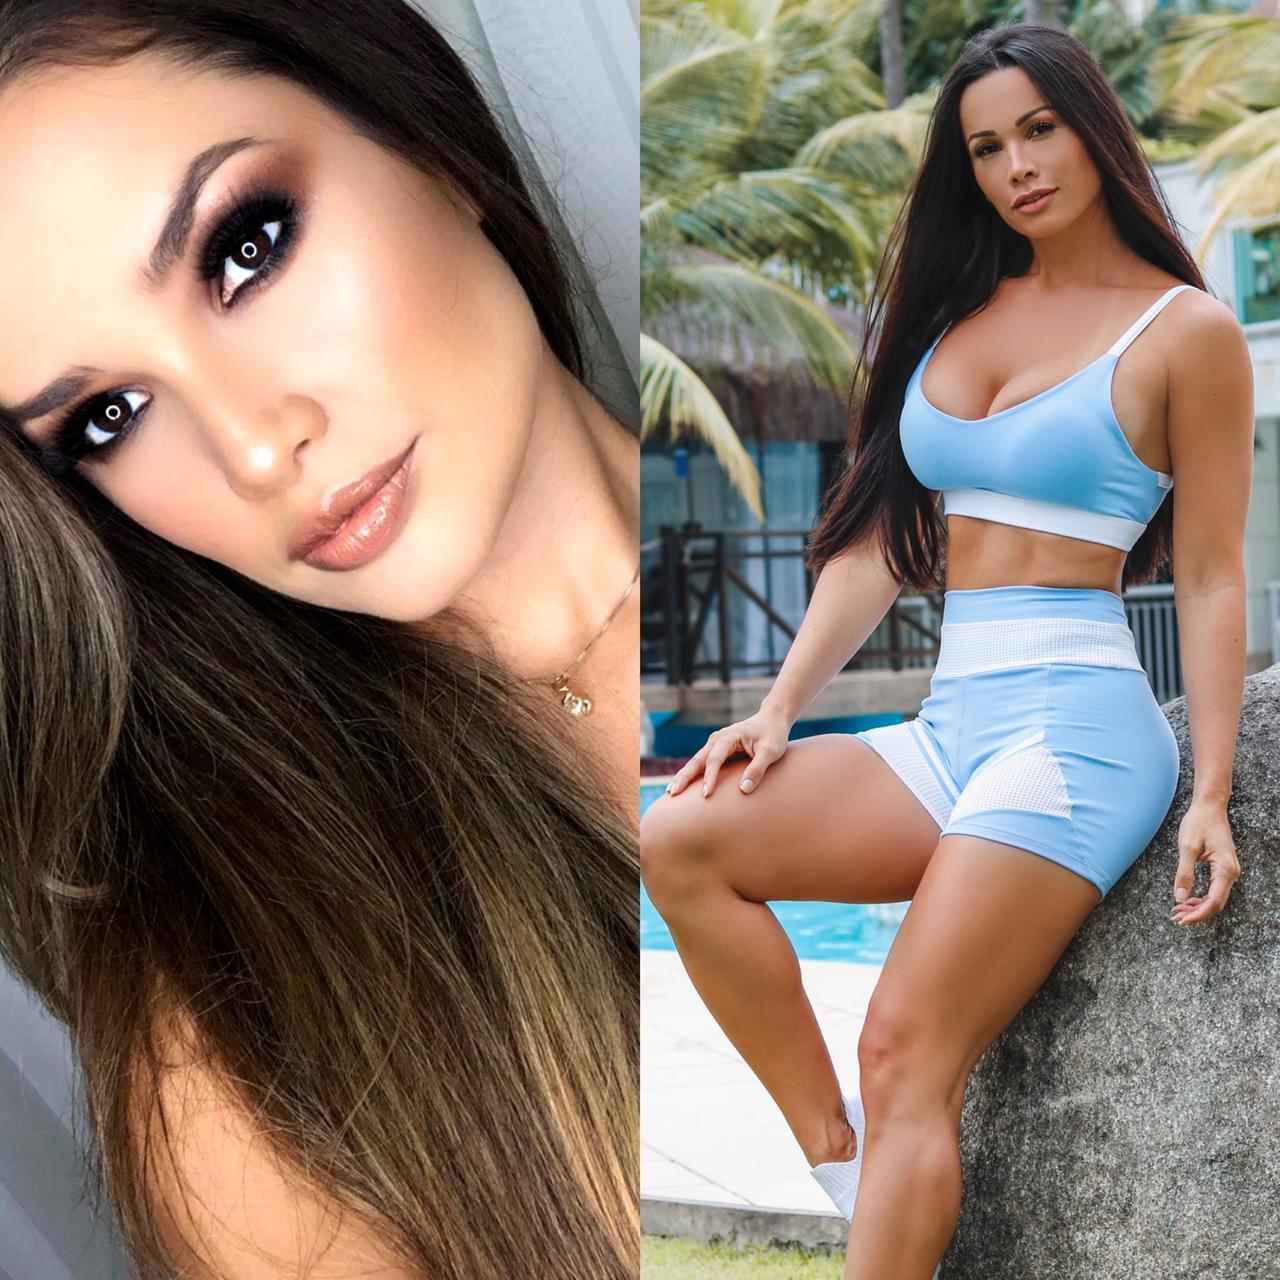 Semelhanças entre Juliette do BBB e Fernanda D´avila viralizam na internet